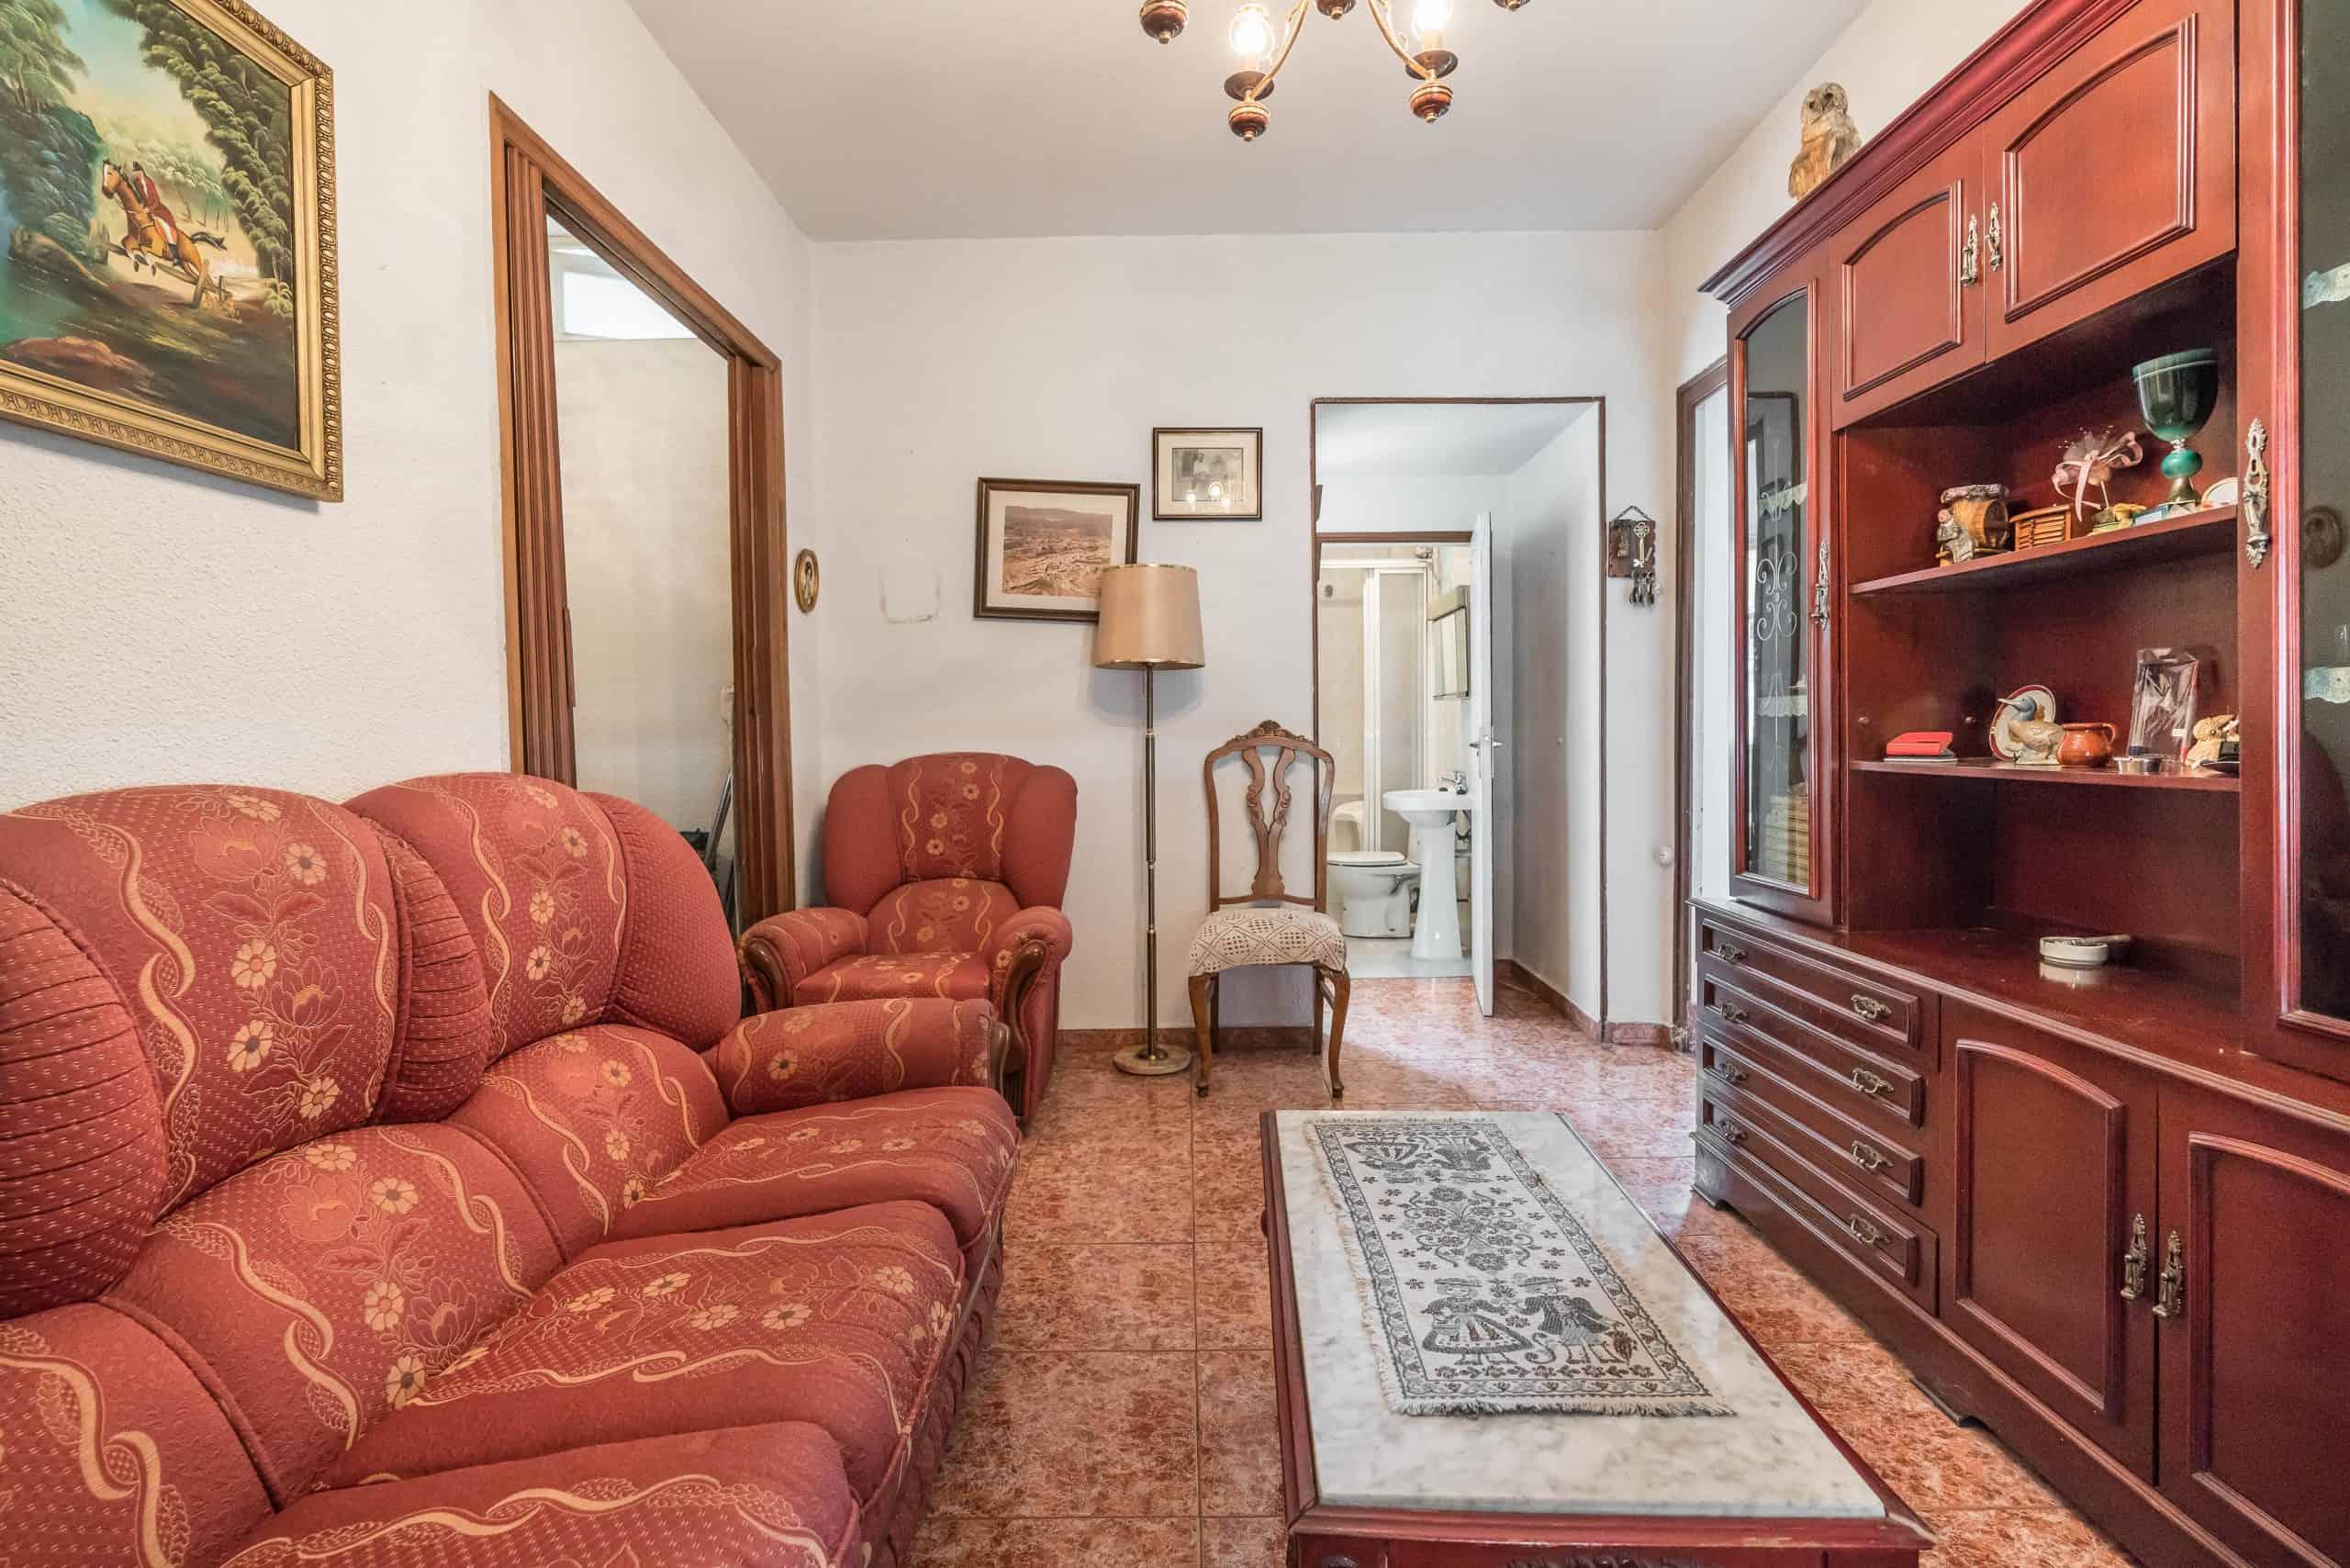 Agencia Inmobiliaria de Madrid-FUTUROCASA-Zona ARGANZUELA-EMBAJADORES-LEGAZPI -calle DOMINGO PEREZ DEL VAL -1 SALON (4)